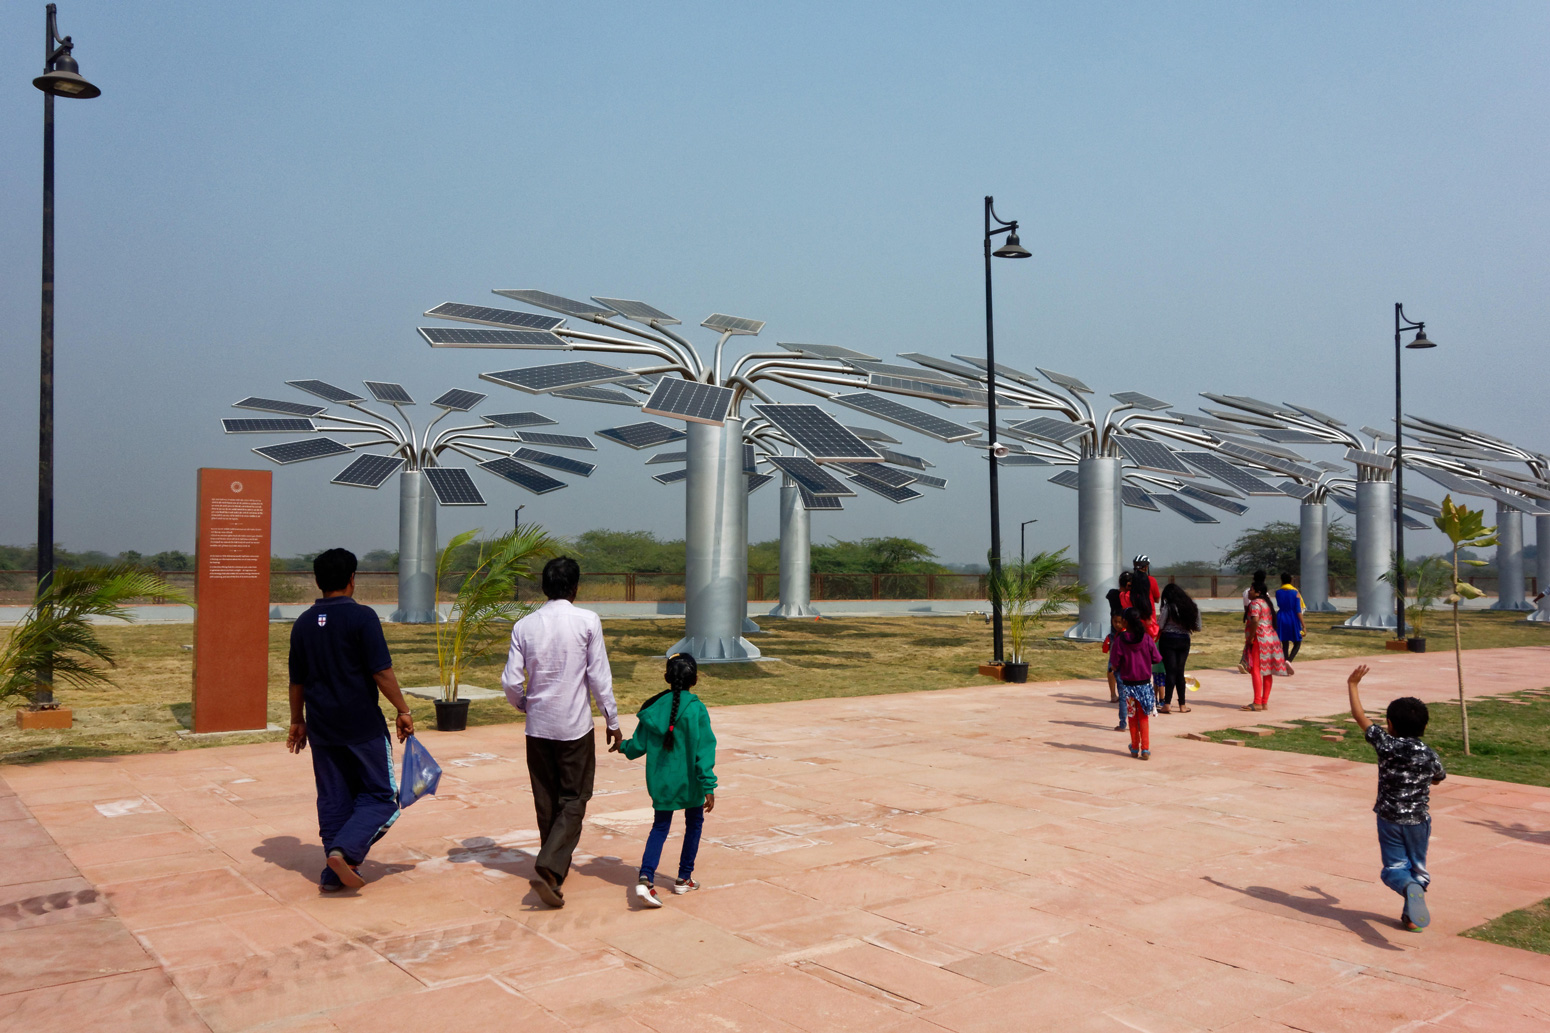 Solar panel trees at the National Salt Satyagraha Memorial, Dandi Beach, Gujarat, India. 3 February 2020.